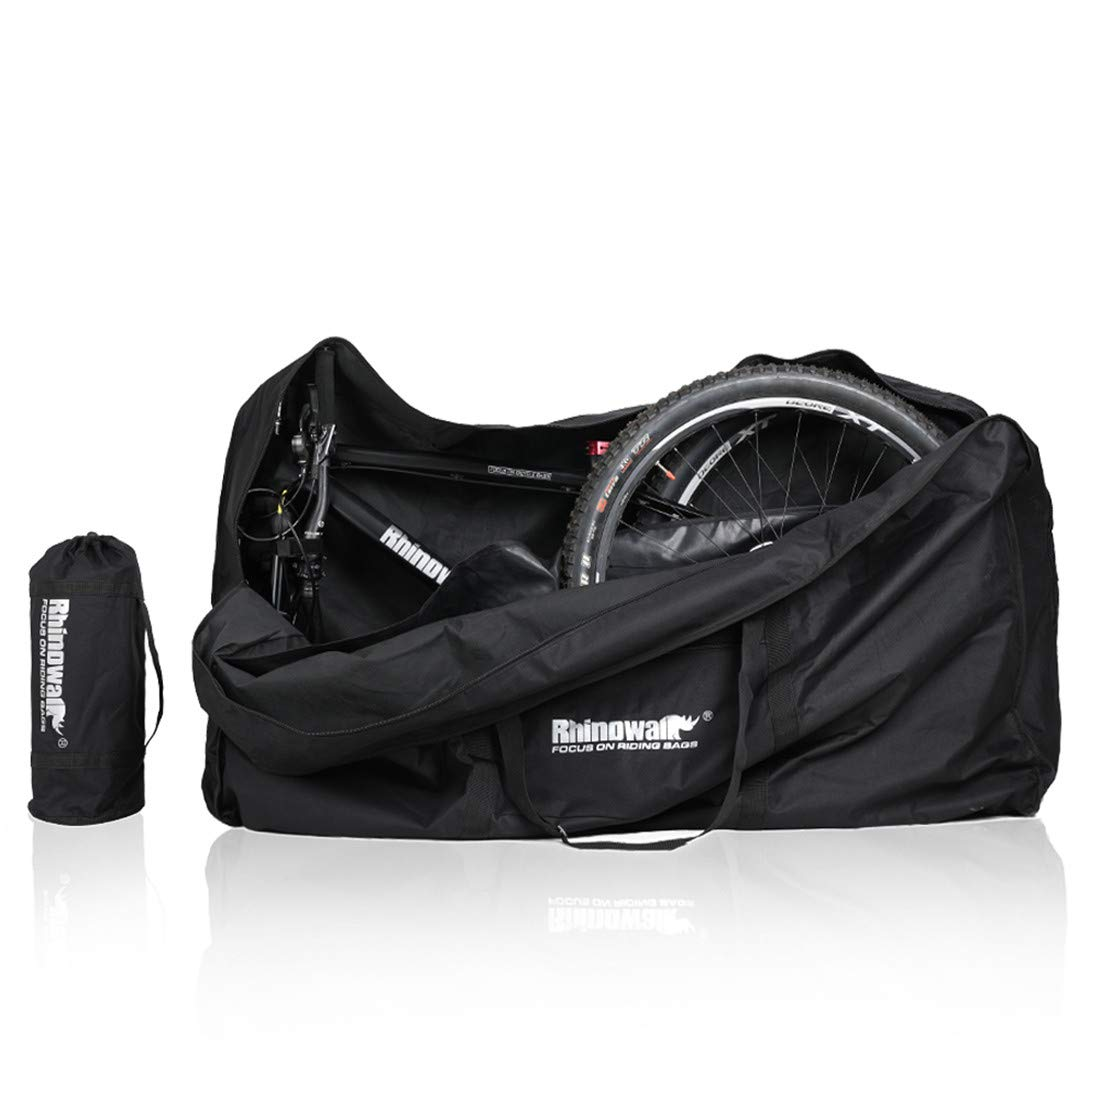 Aophire Folding Bike Bag